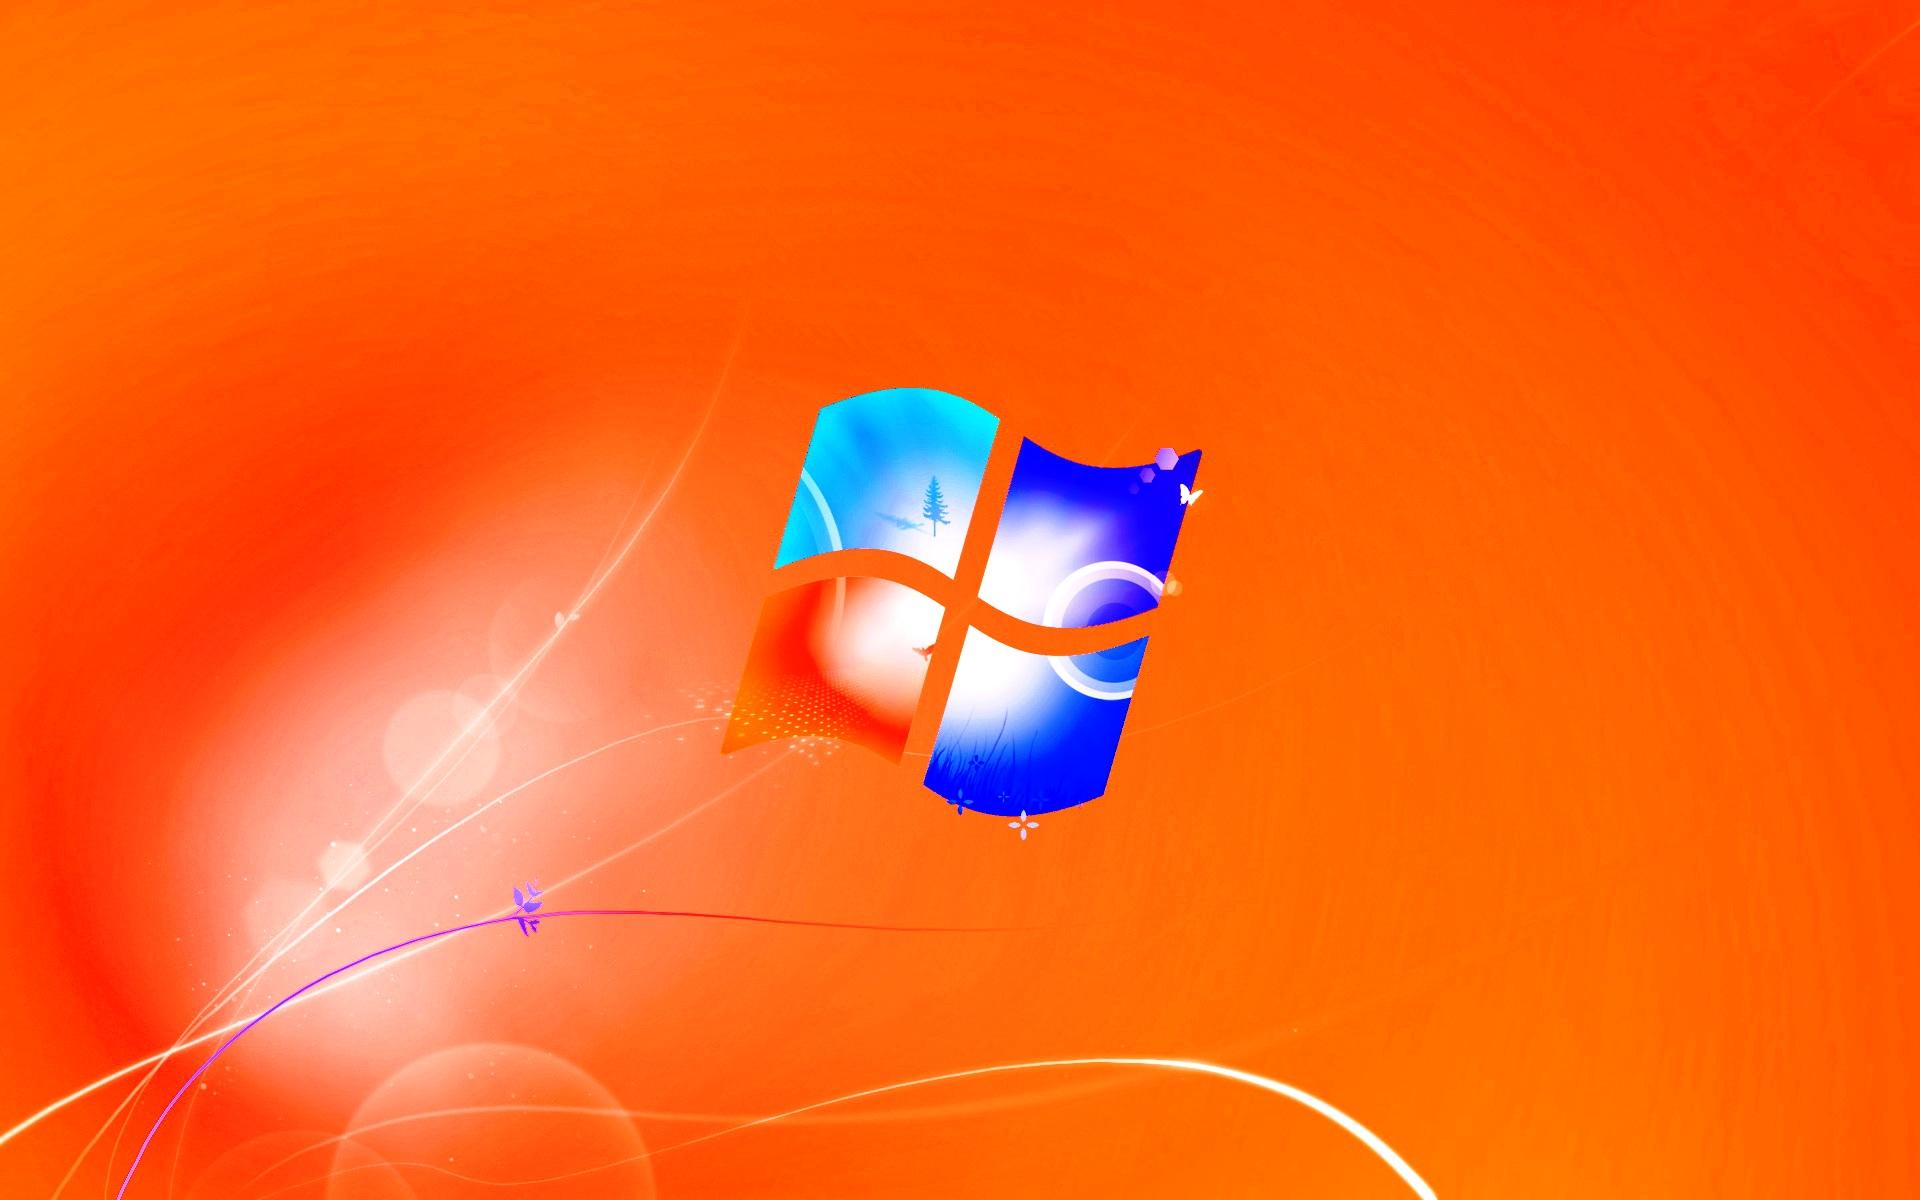 Free Animated Desktop Wallpaper For Windows 7 - 1920x1200 Wallpaper -  teahub.io